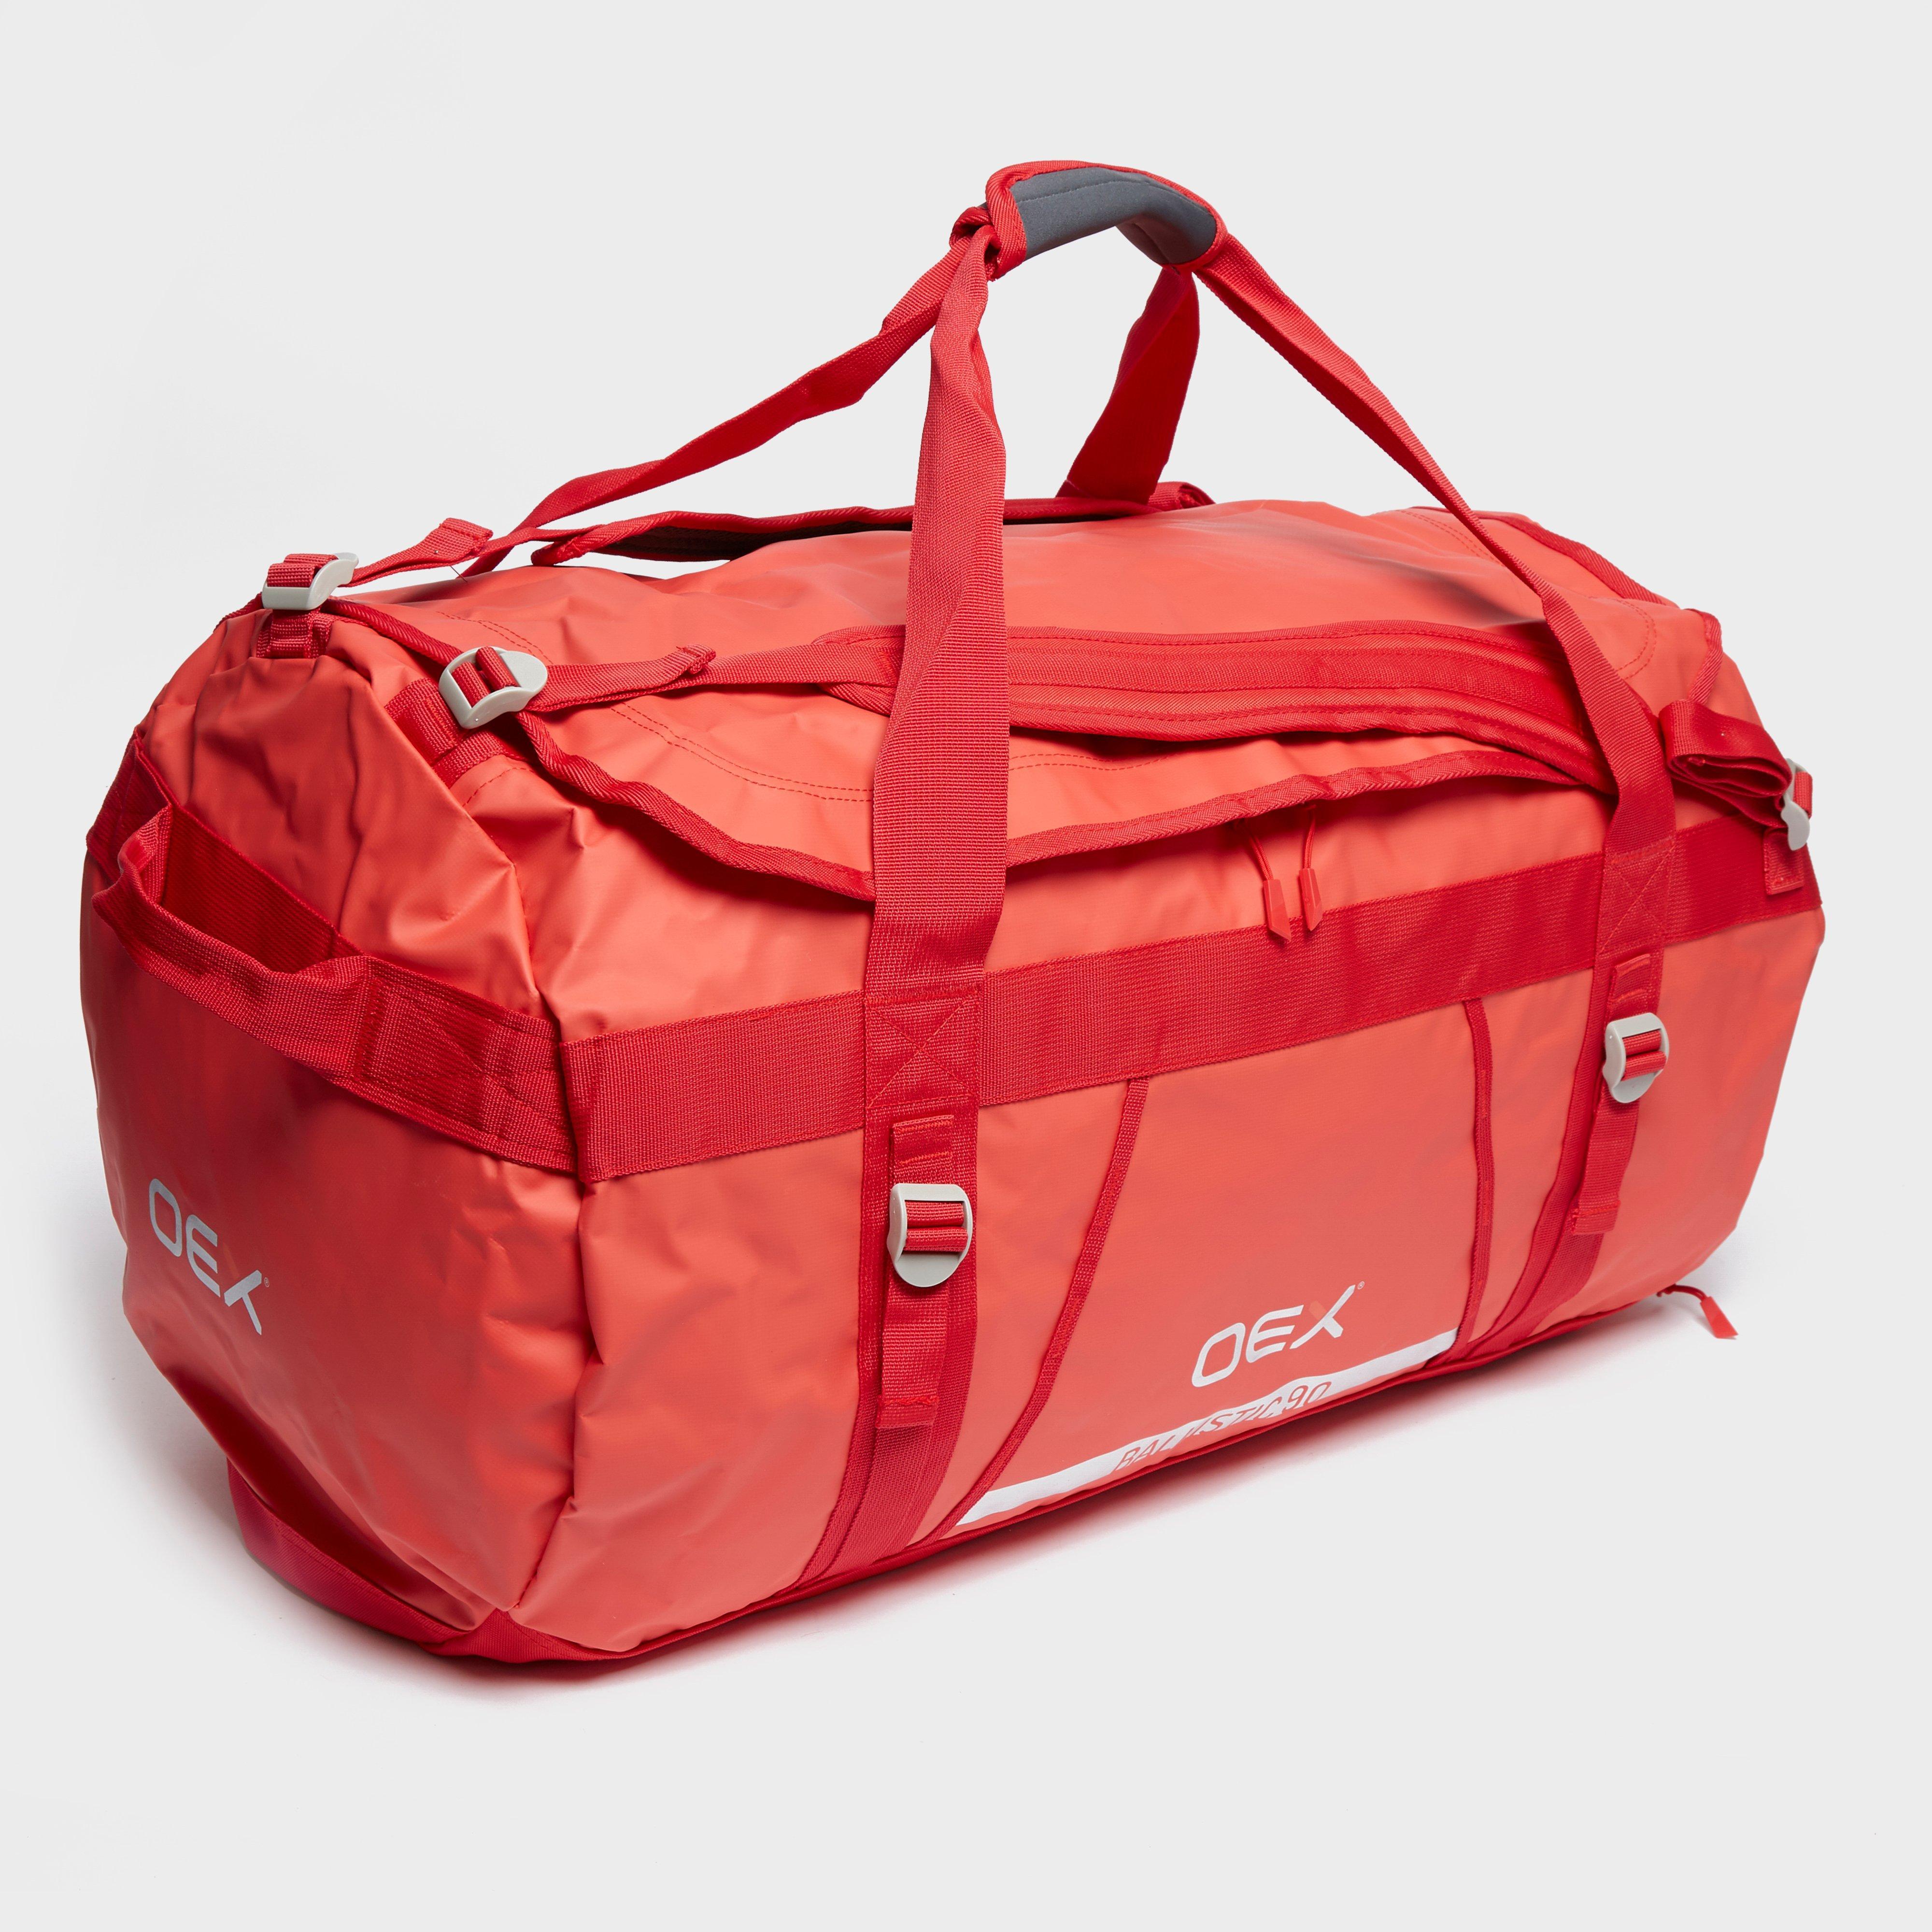 Oex Ballistic 90L Cargo Bag - Red/Cargo, Red